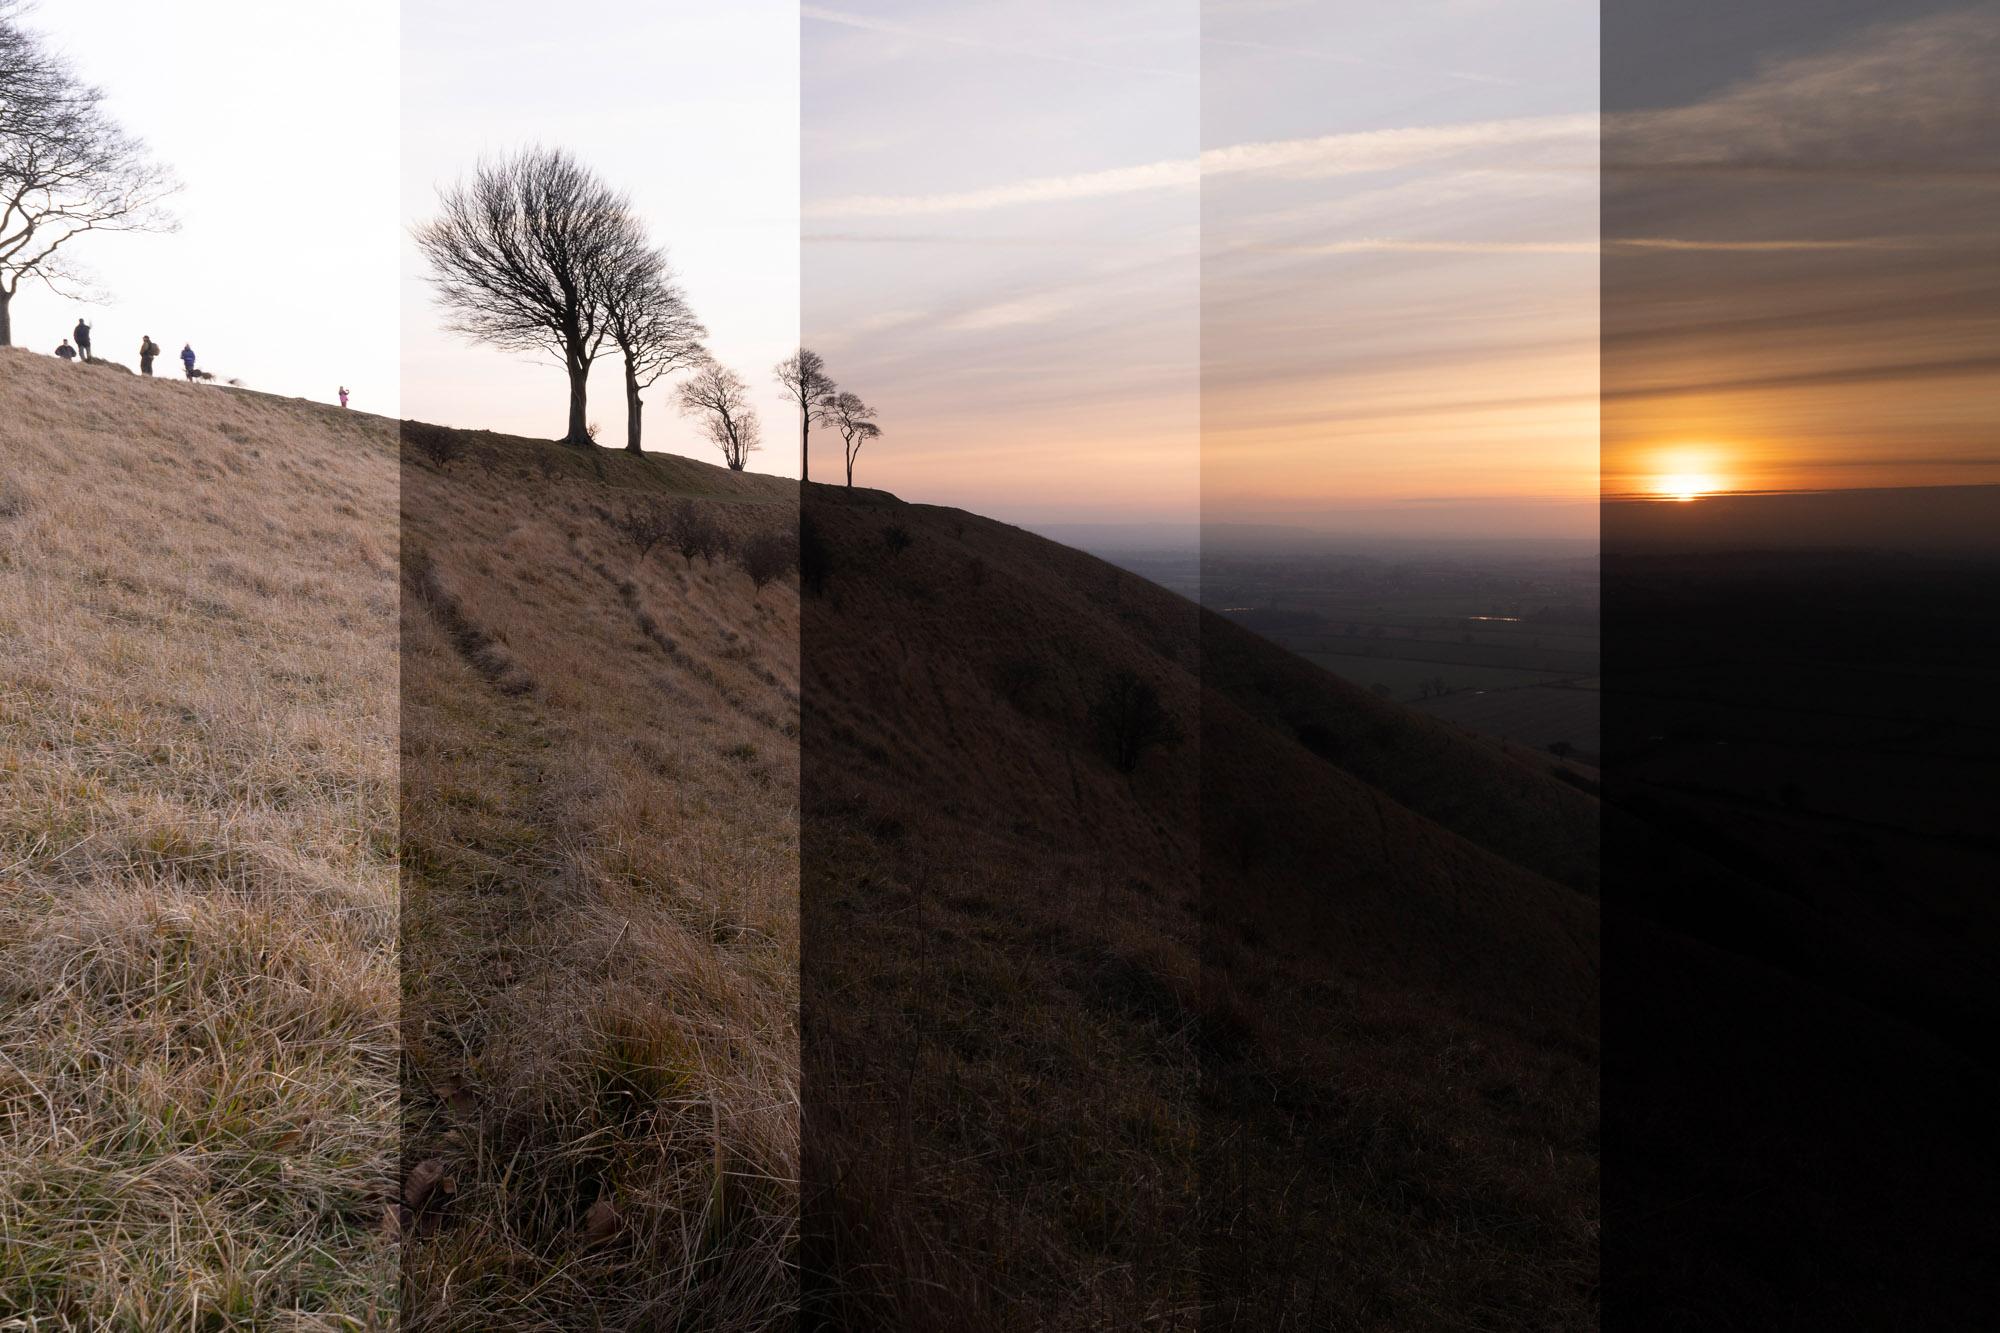 A bracketed landscape scene